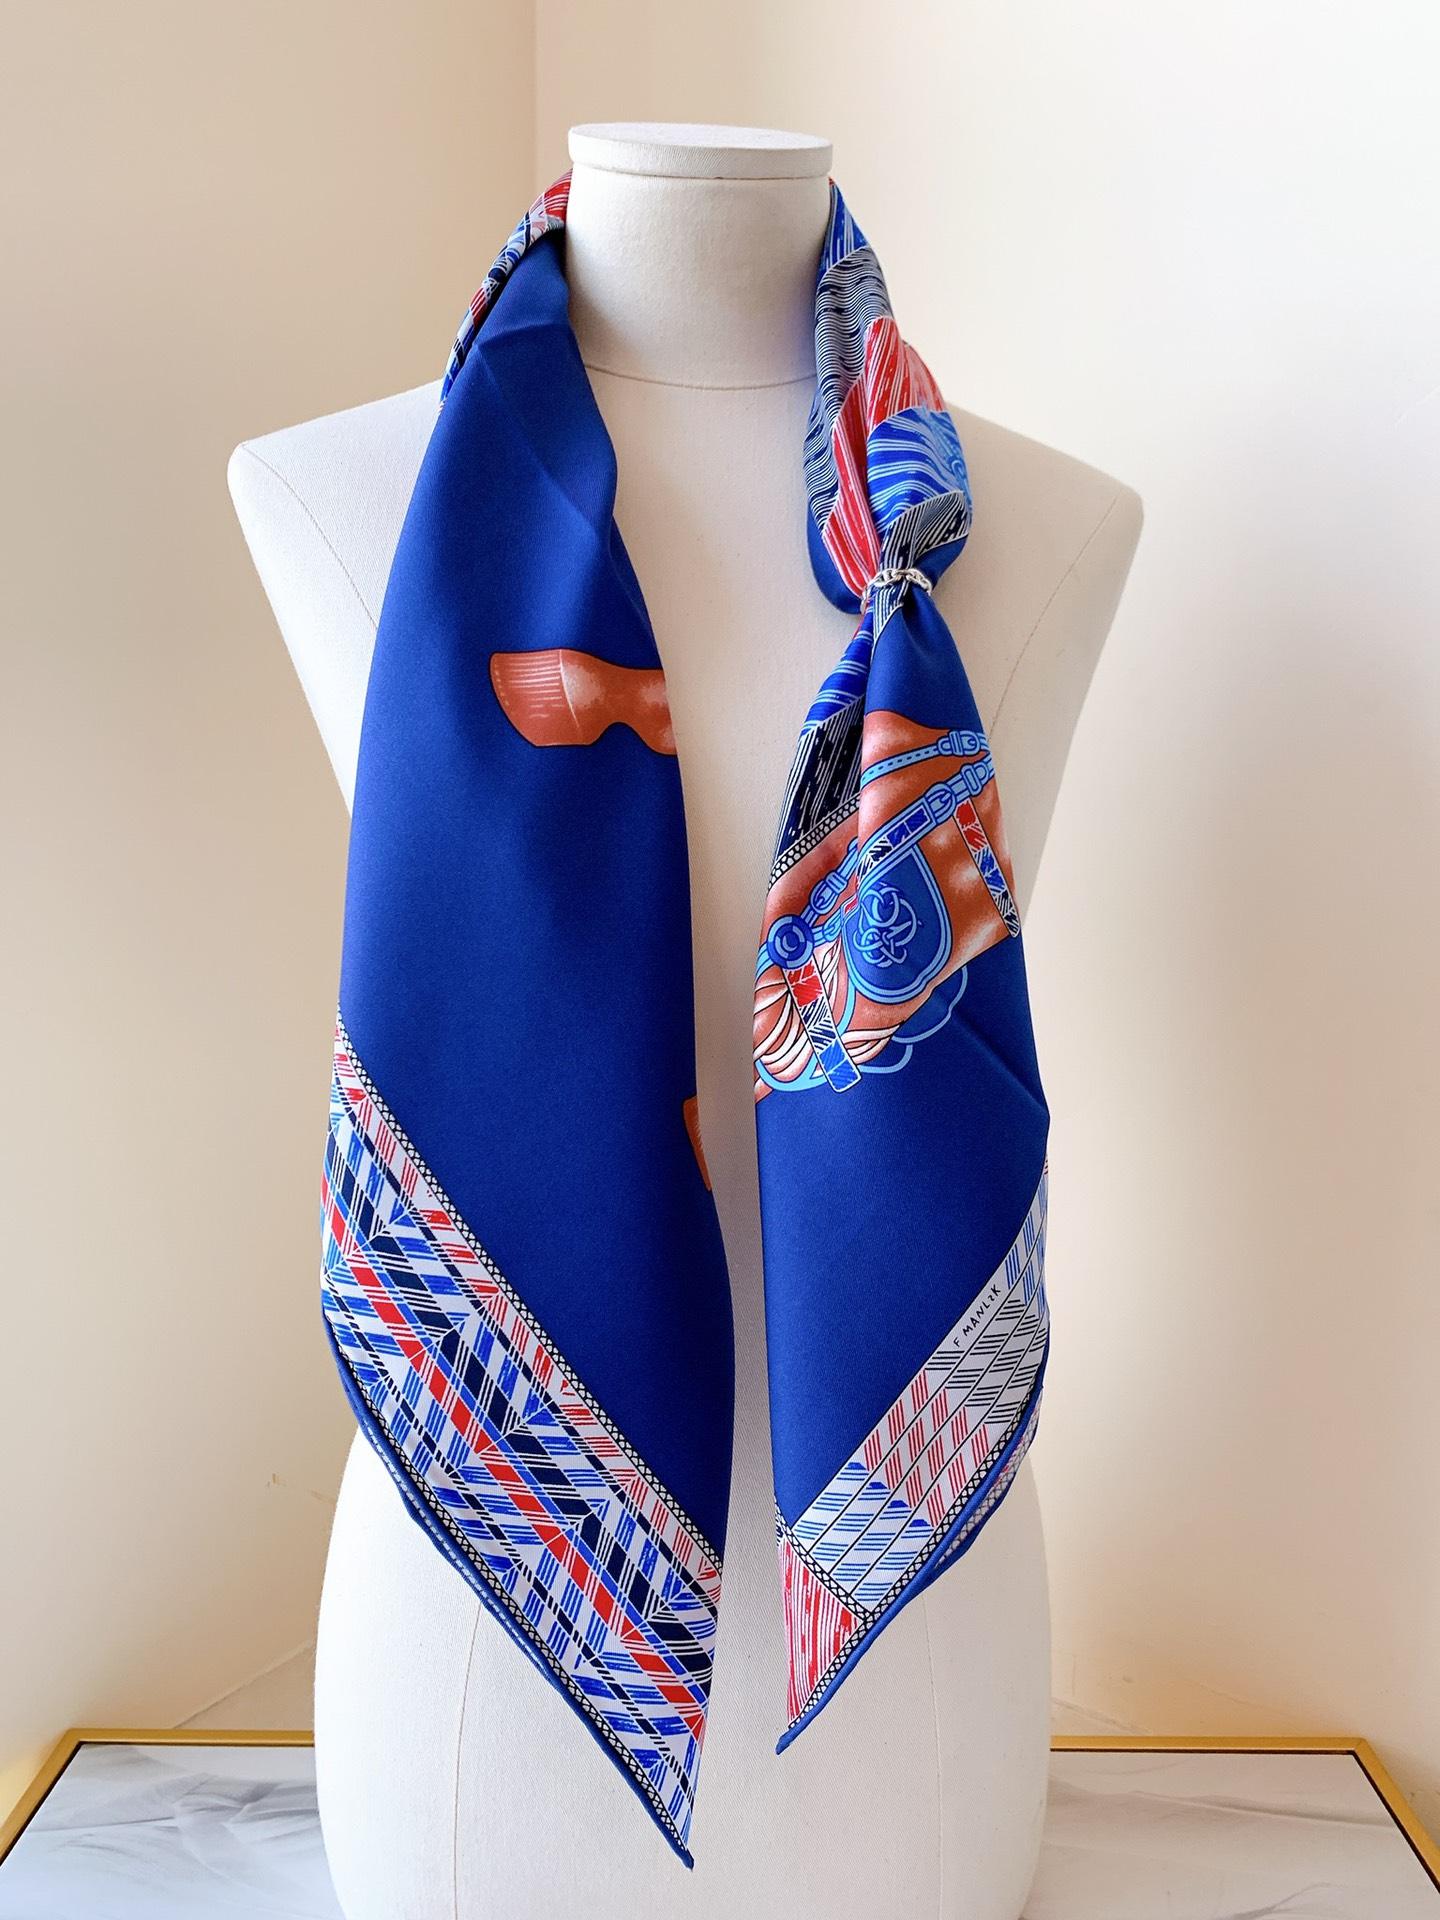 Hermes 新季度《骏马披挂》蚕丝方巾 《深蓝》 20年新版骏马图案丝巾